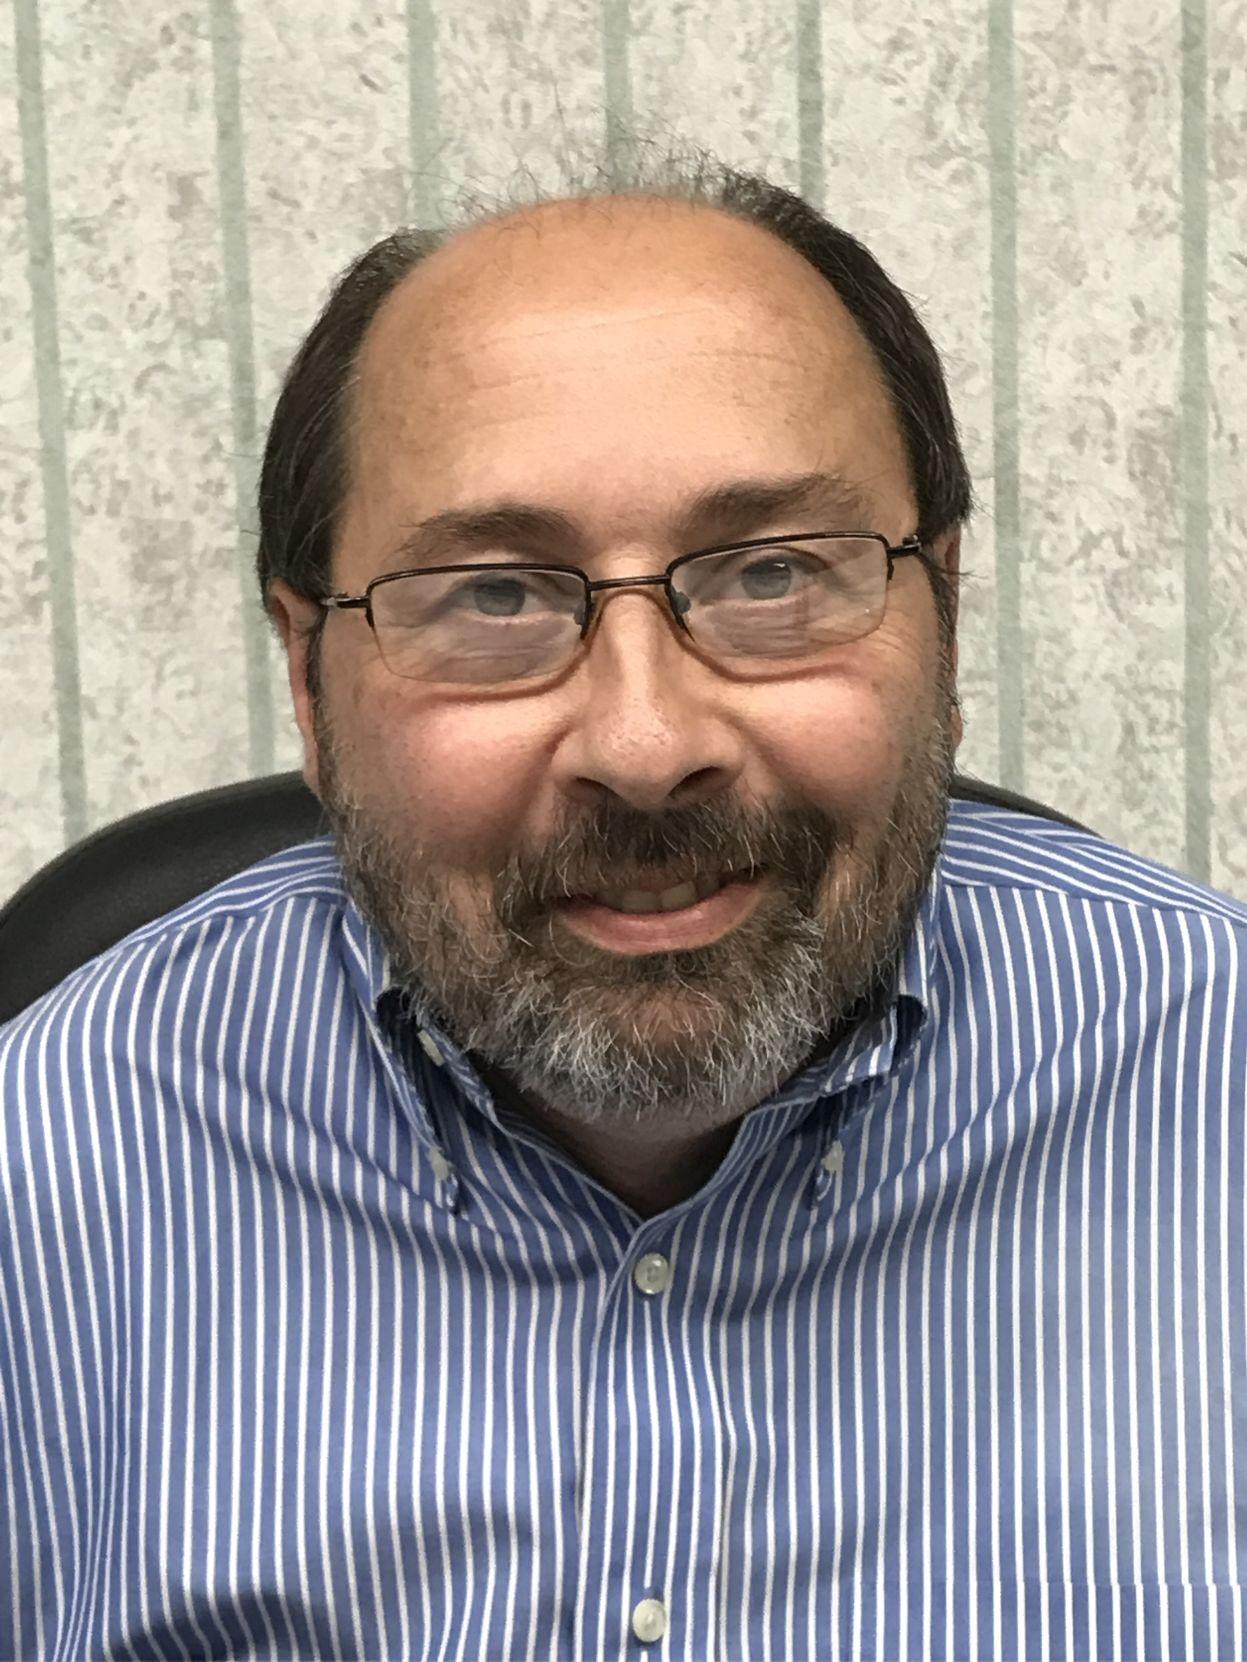 Jean Manuel Guillot